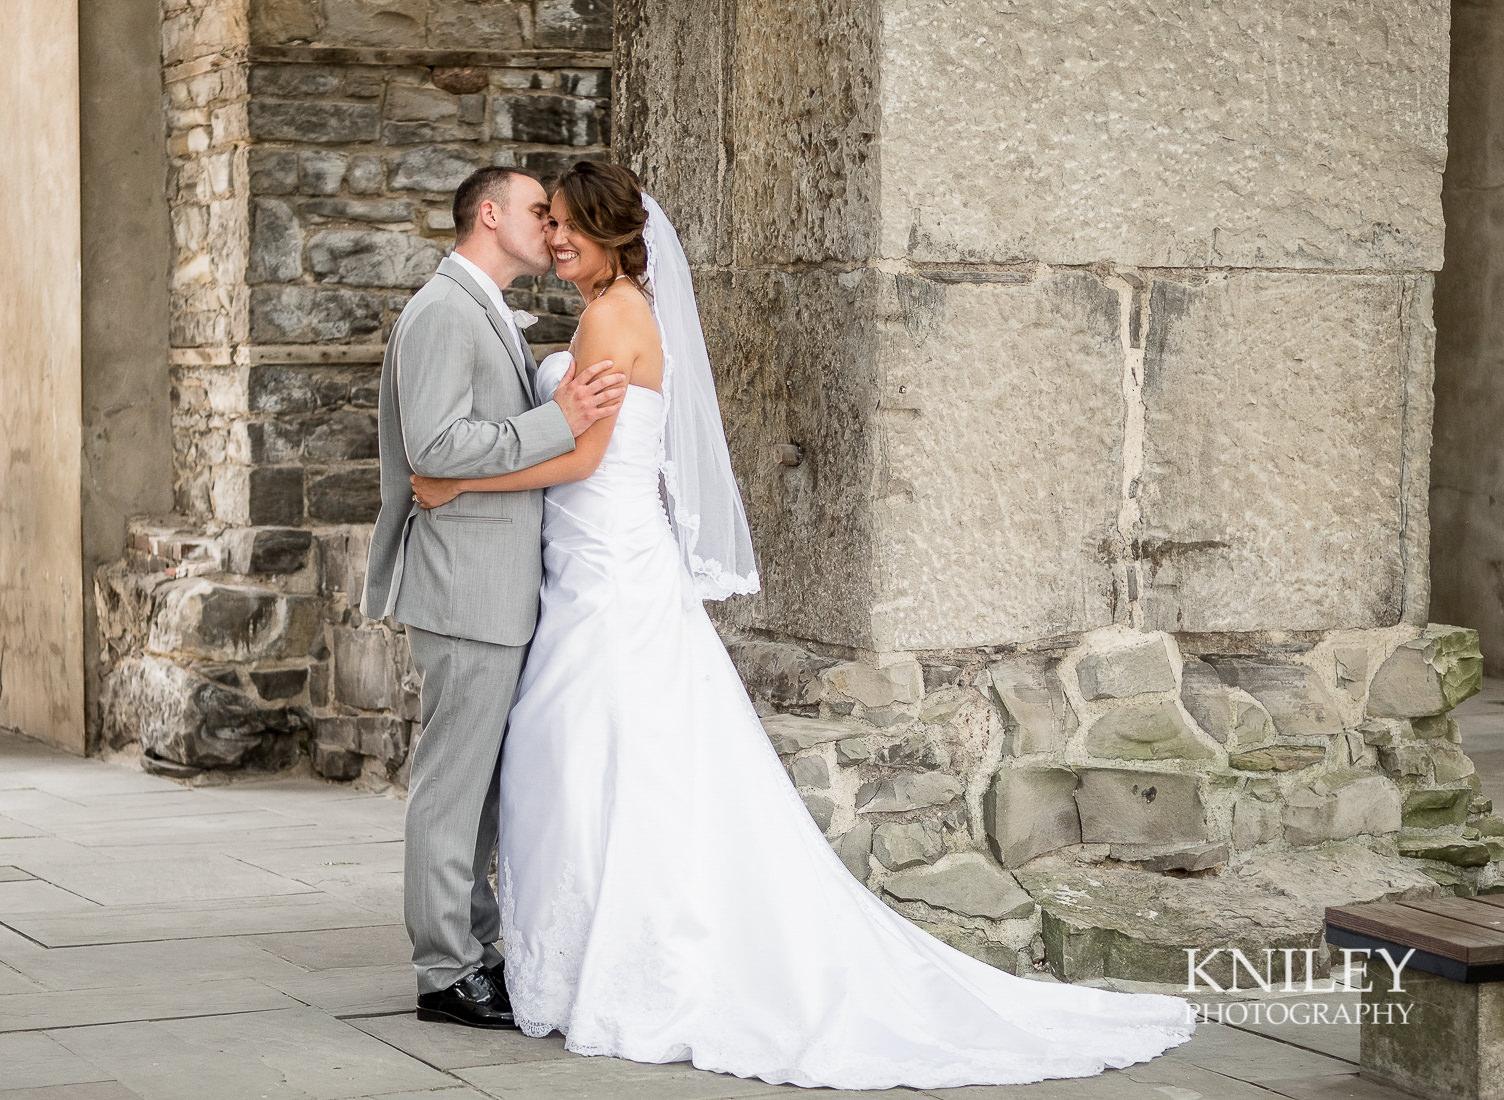 080a - St Josephs Park Wedding Picture - Rochester NY - XT2B0469.jpg